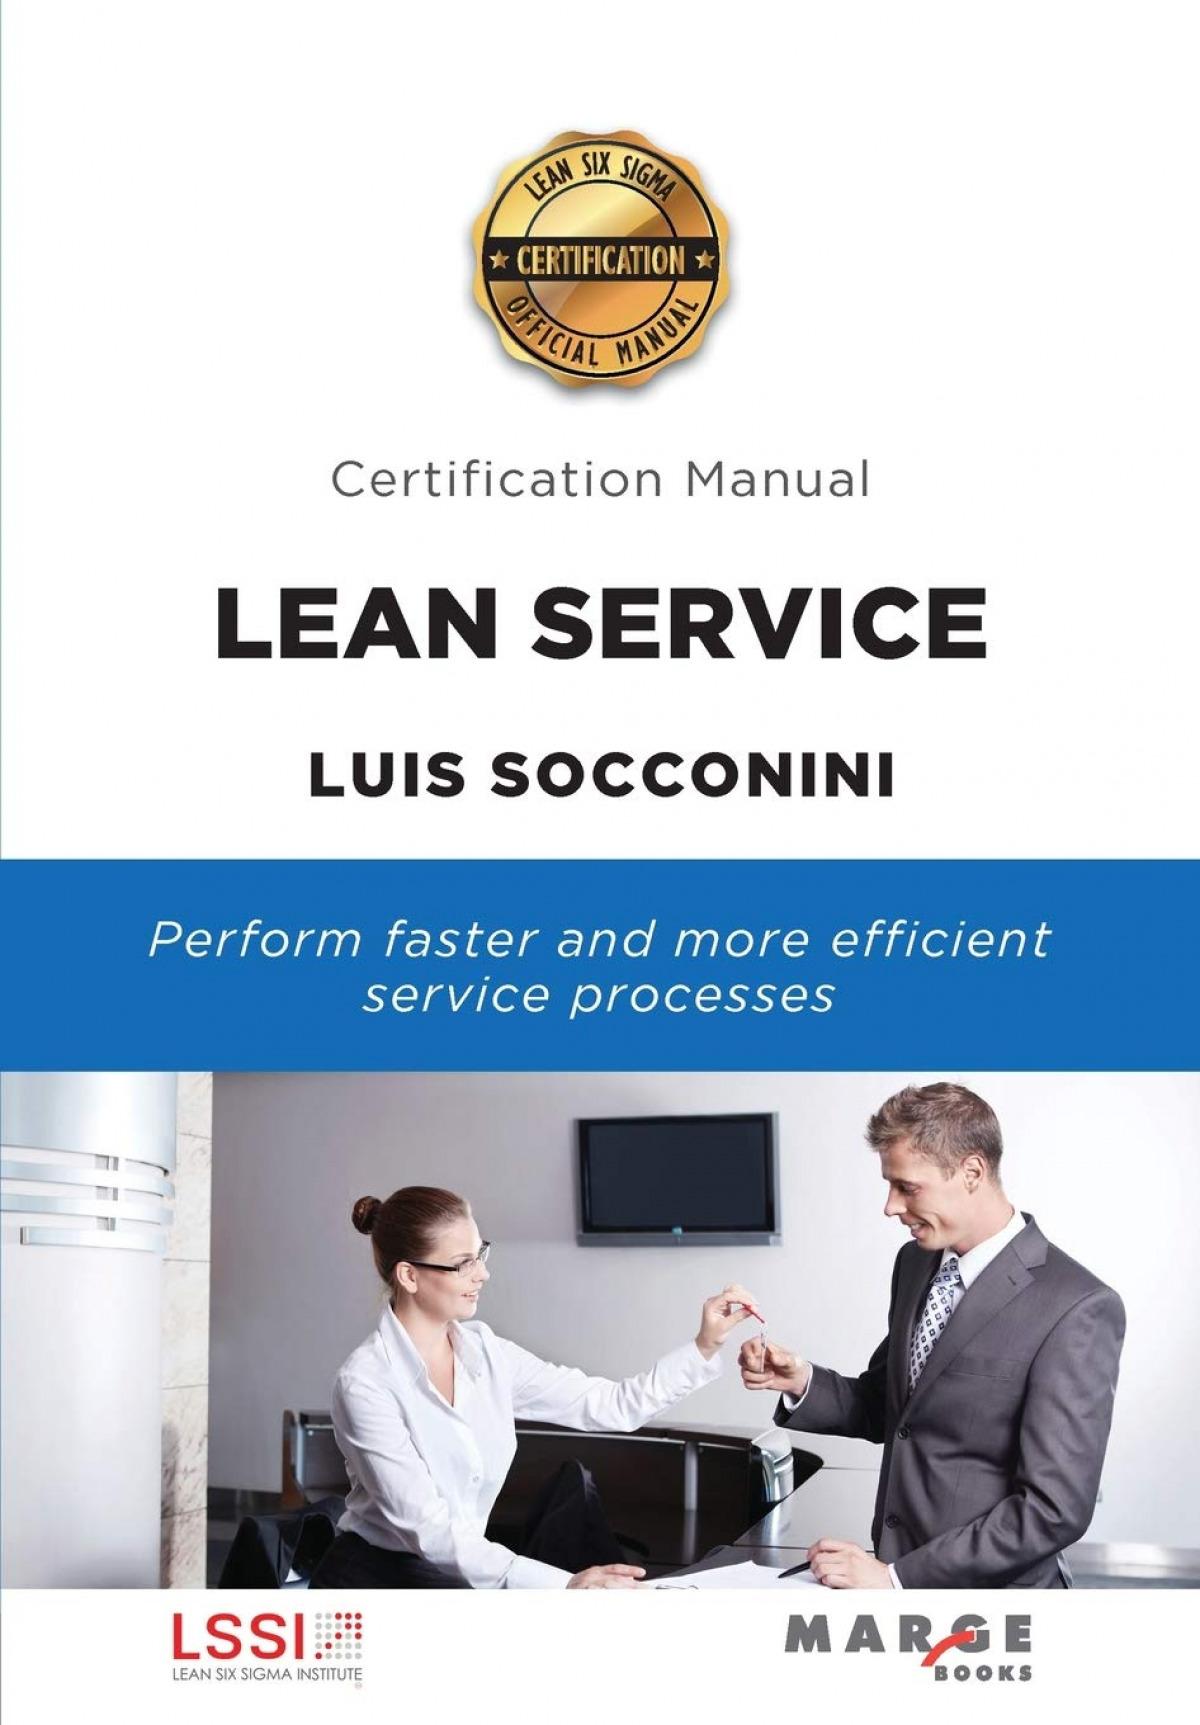 Lean Service. Certification Manual